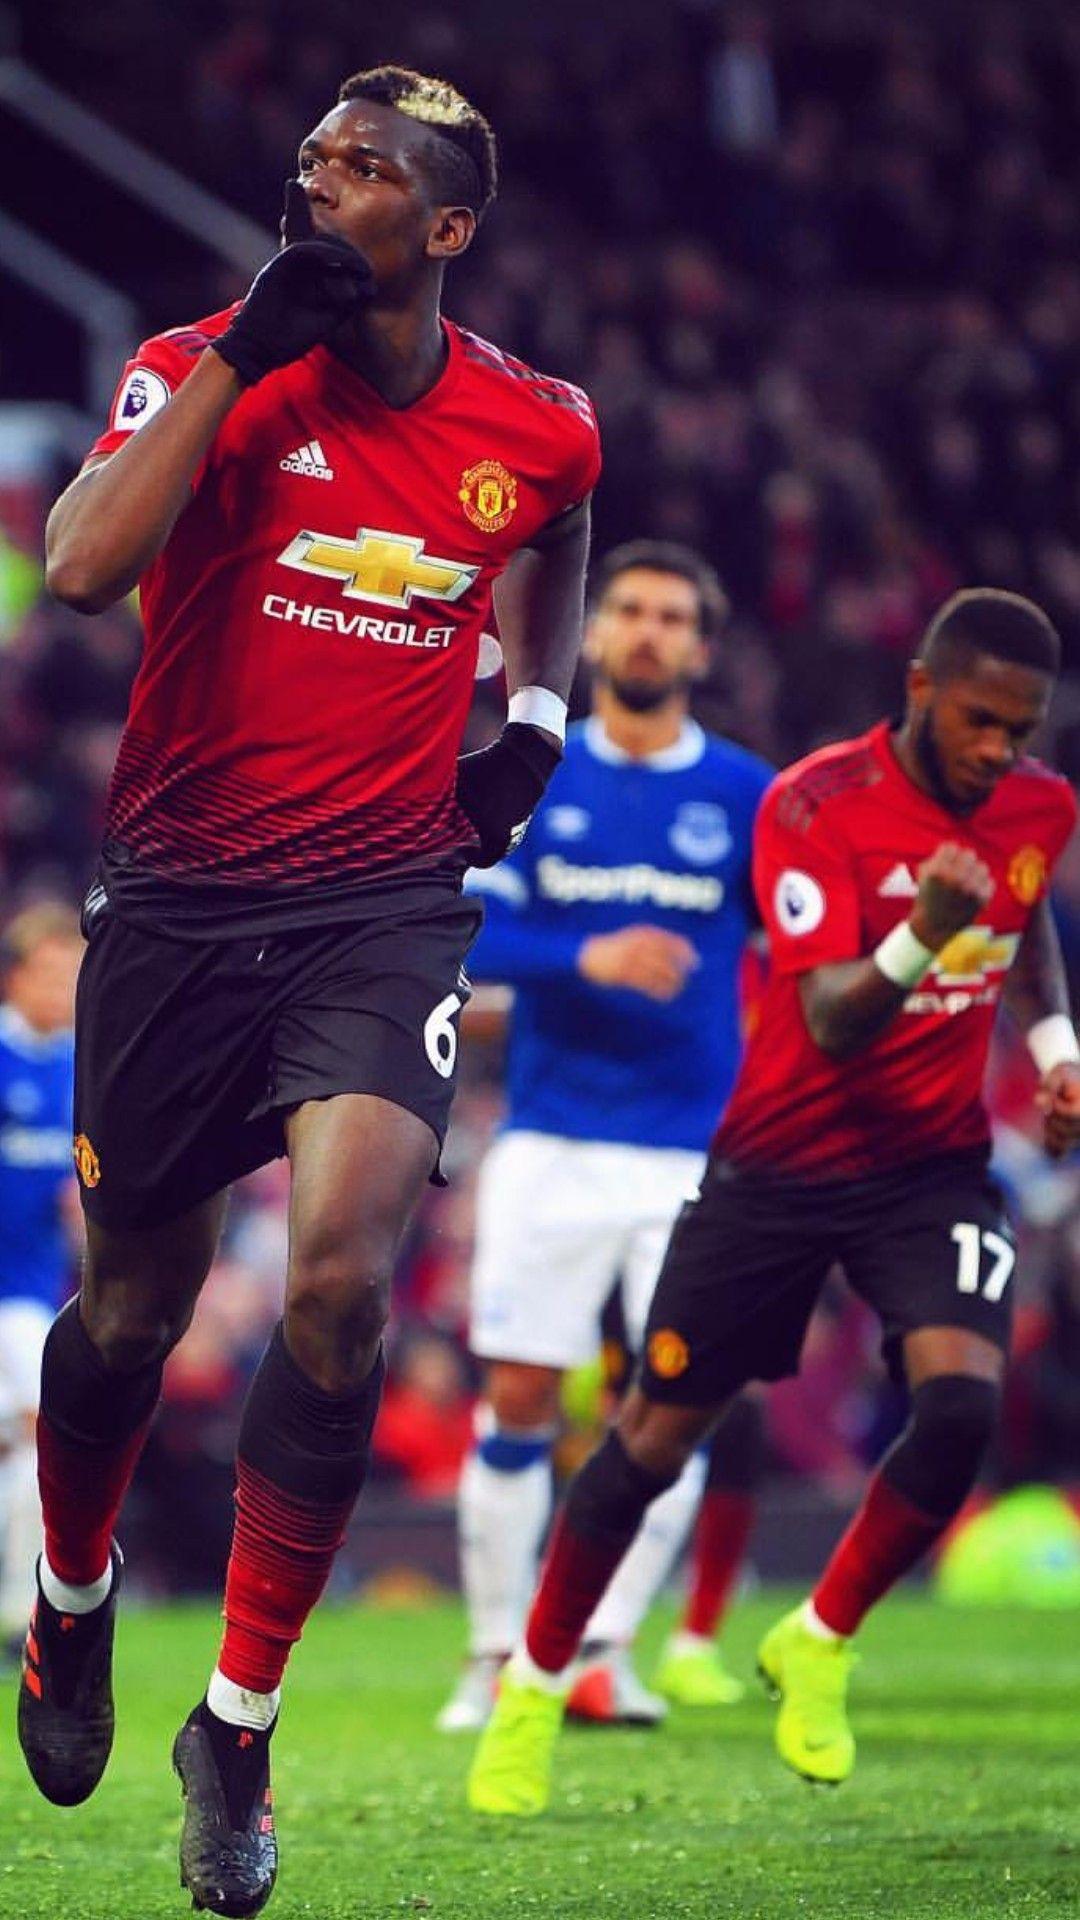 Pogbaa Scores Vs Everton Paulpogba Manchesterunited 2 1 Everton Manchester United Football Manchester United Manchester United Wallpaper